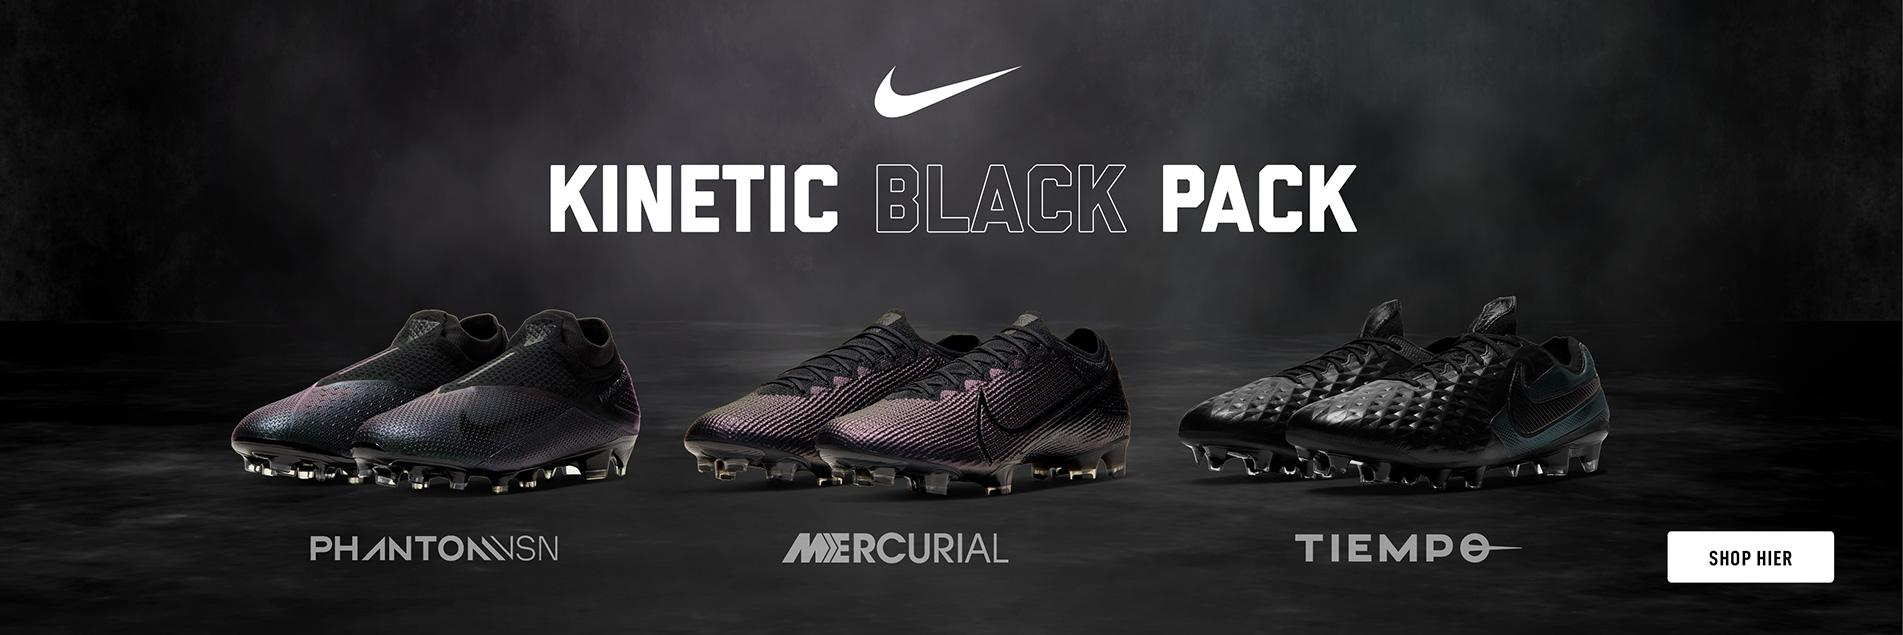 Nike Kinetic Black